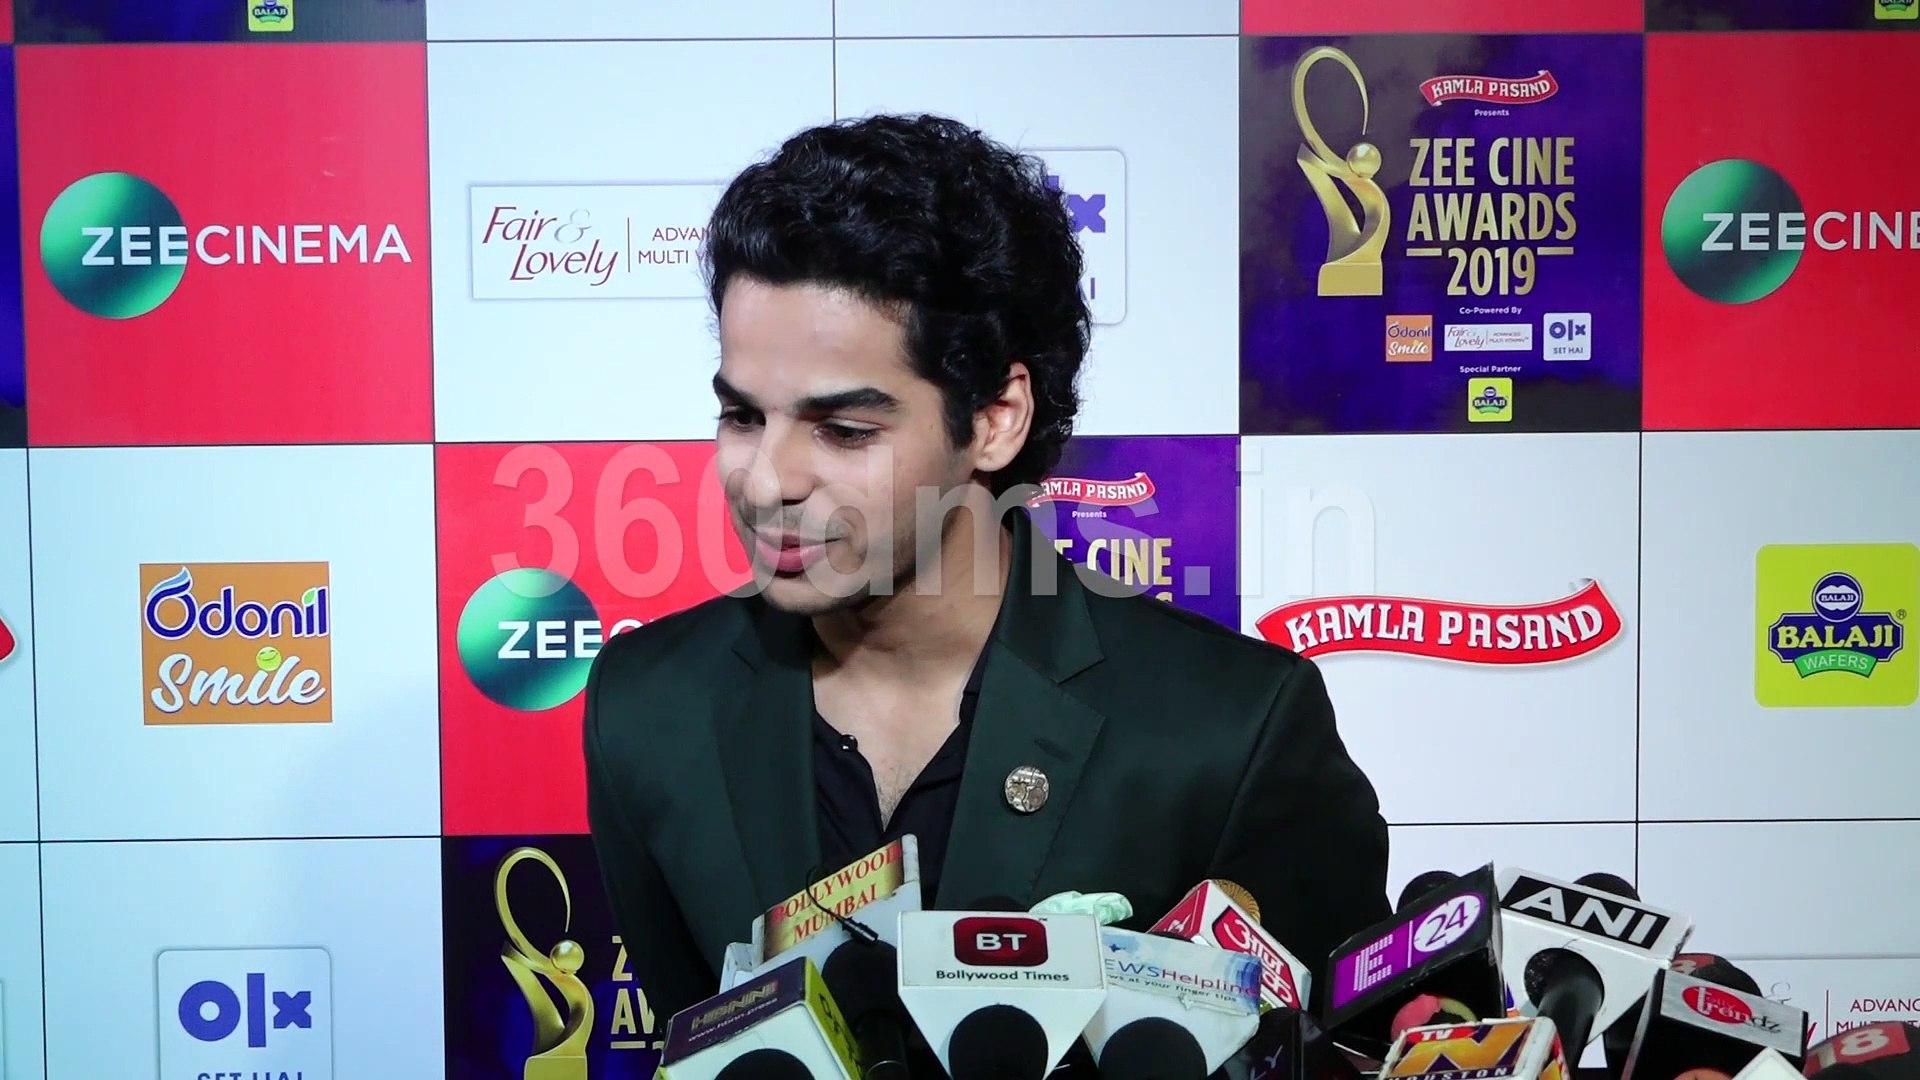 Ishan Khattar Talks About His Plan For Holi Celebration